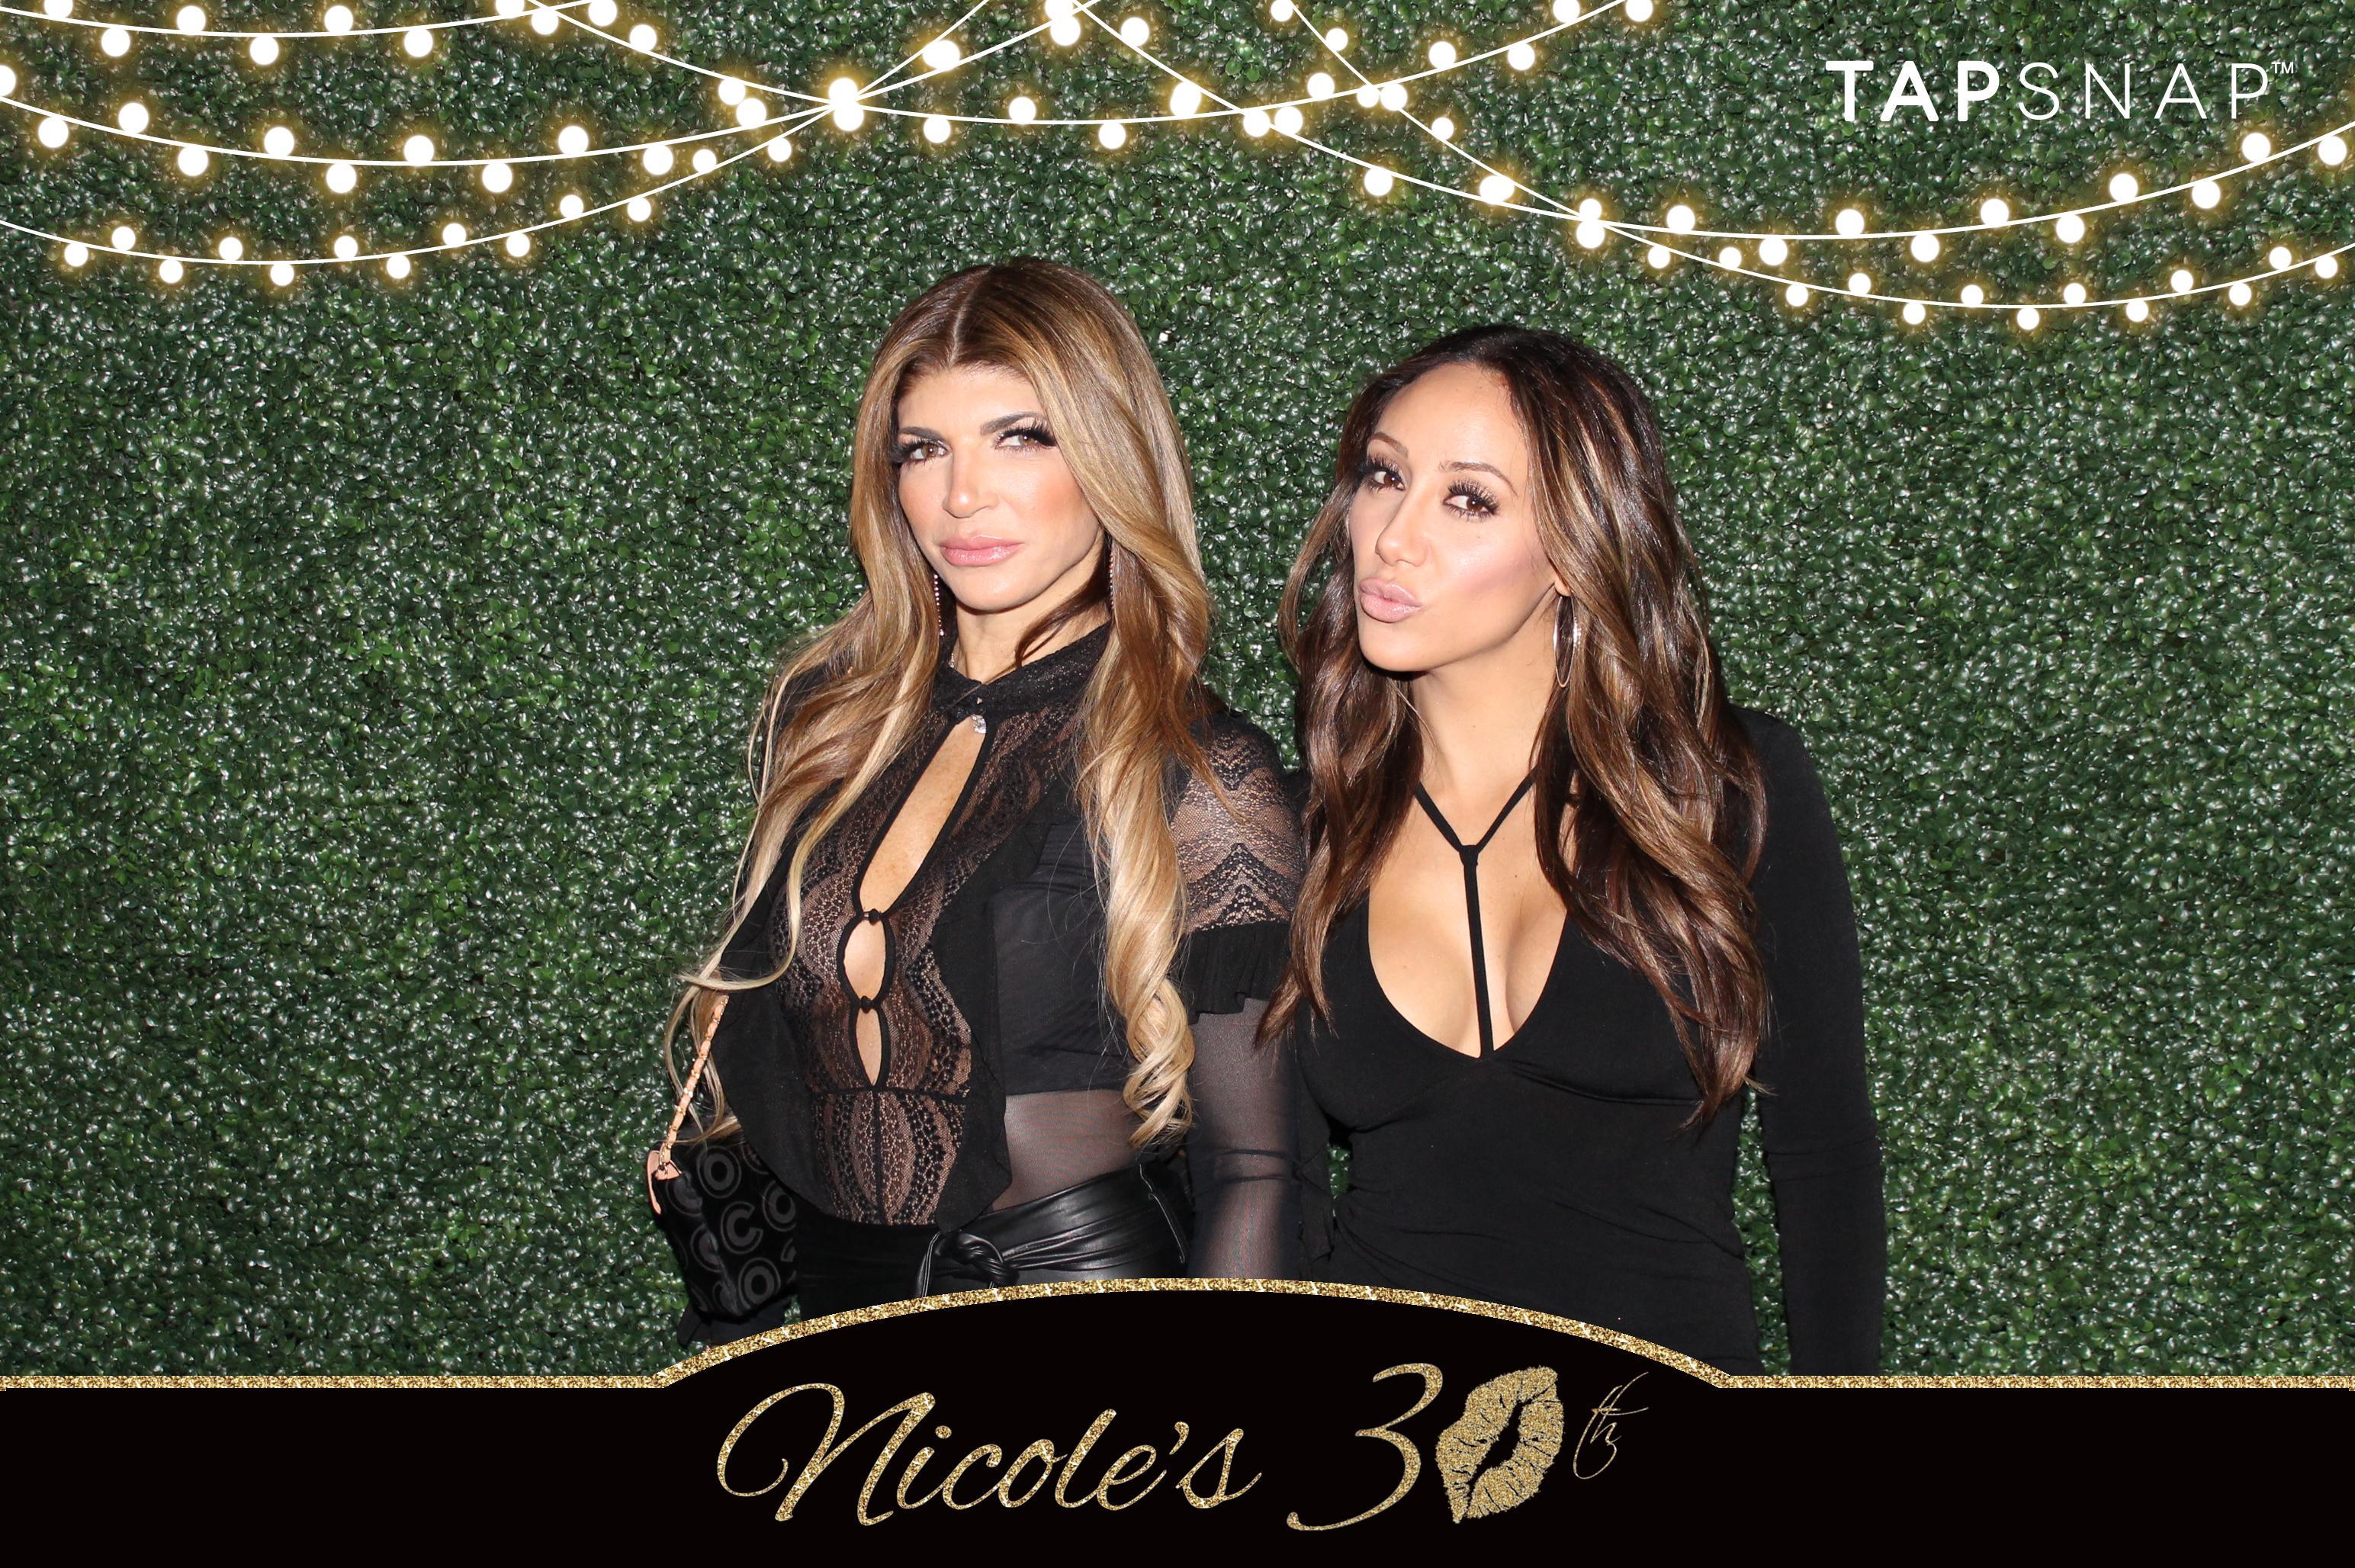 Teresa and Melissa using TapSnap